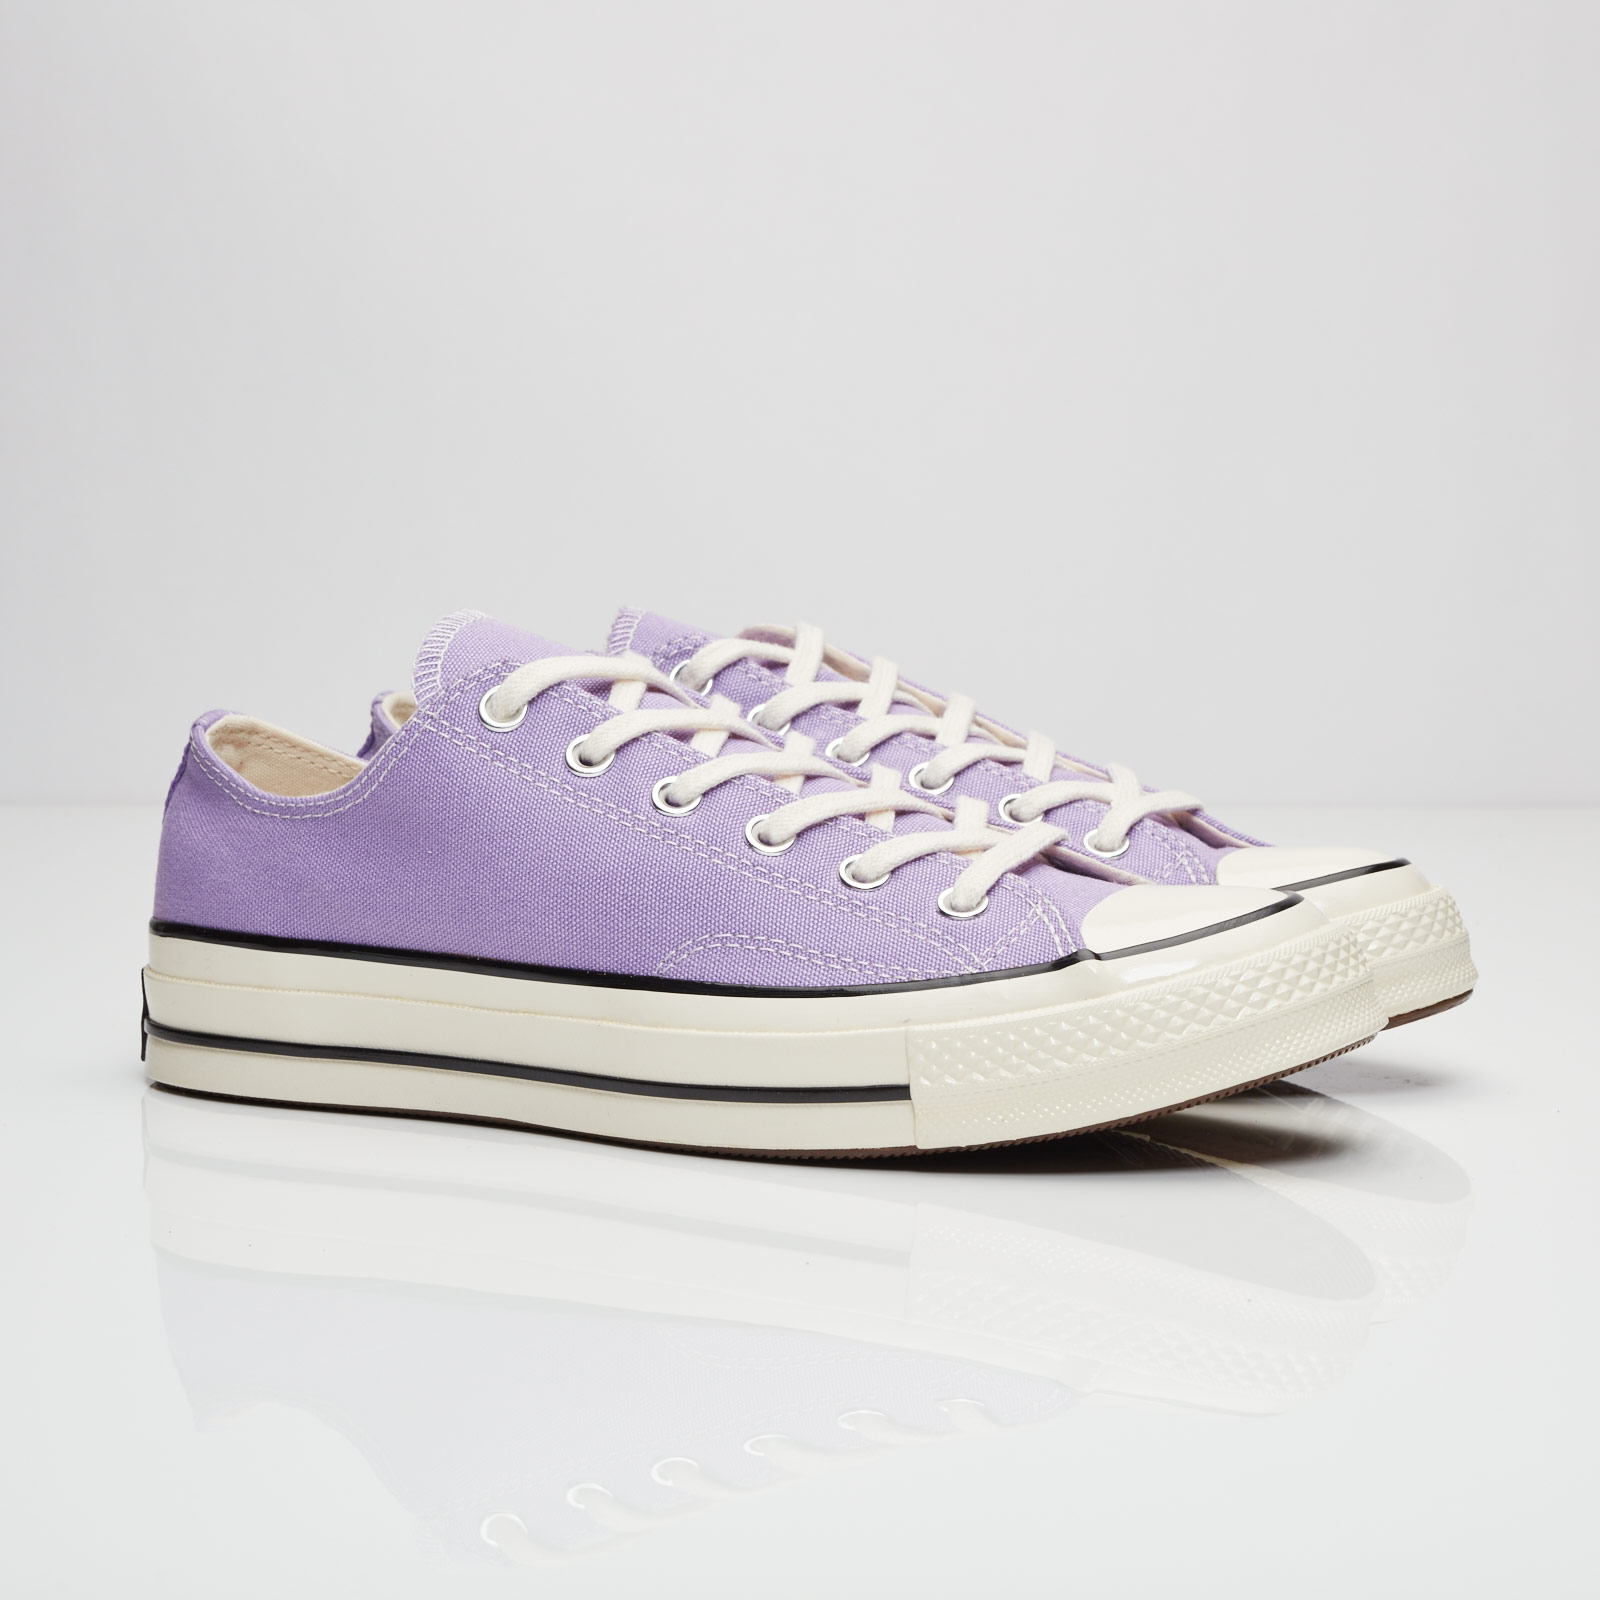 45ff7825f76df Converse Converse 70 Ox - 153879c - Sneakersnstuff